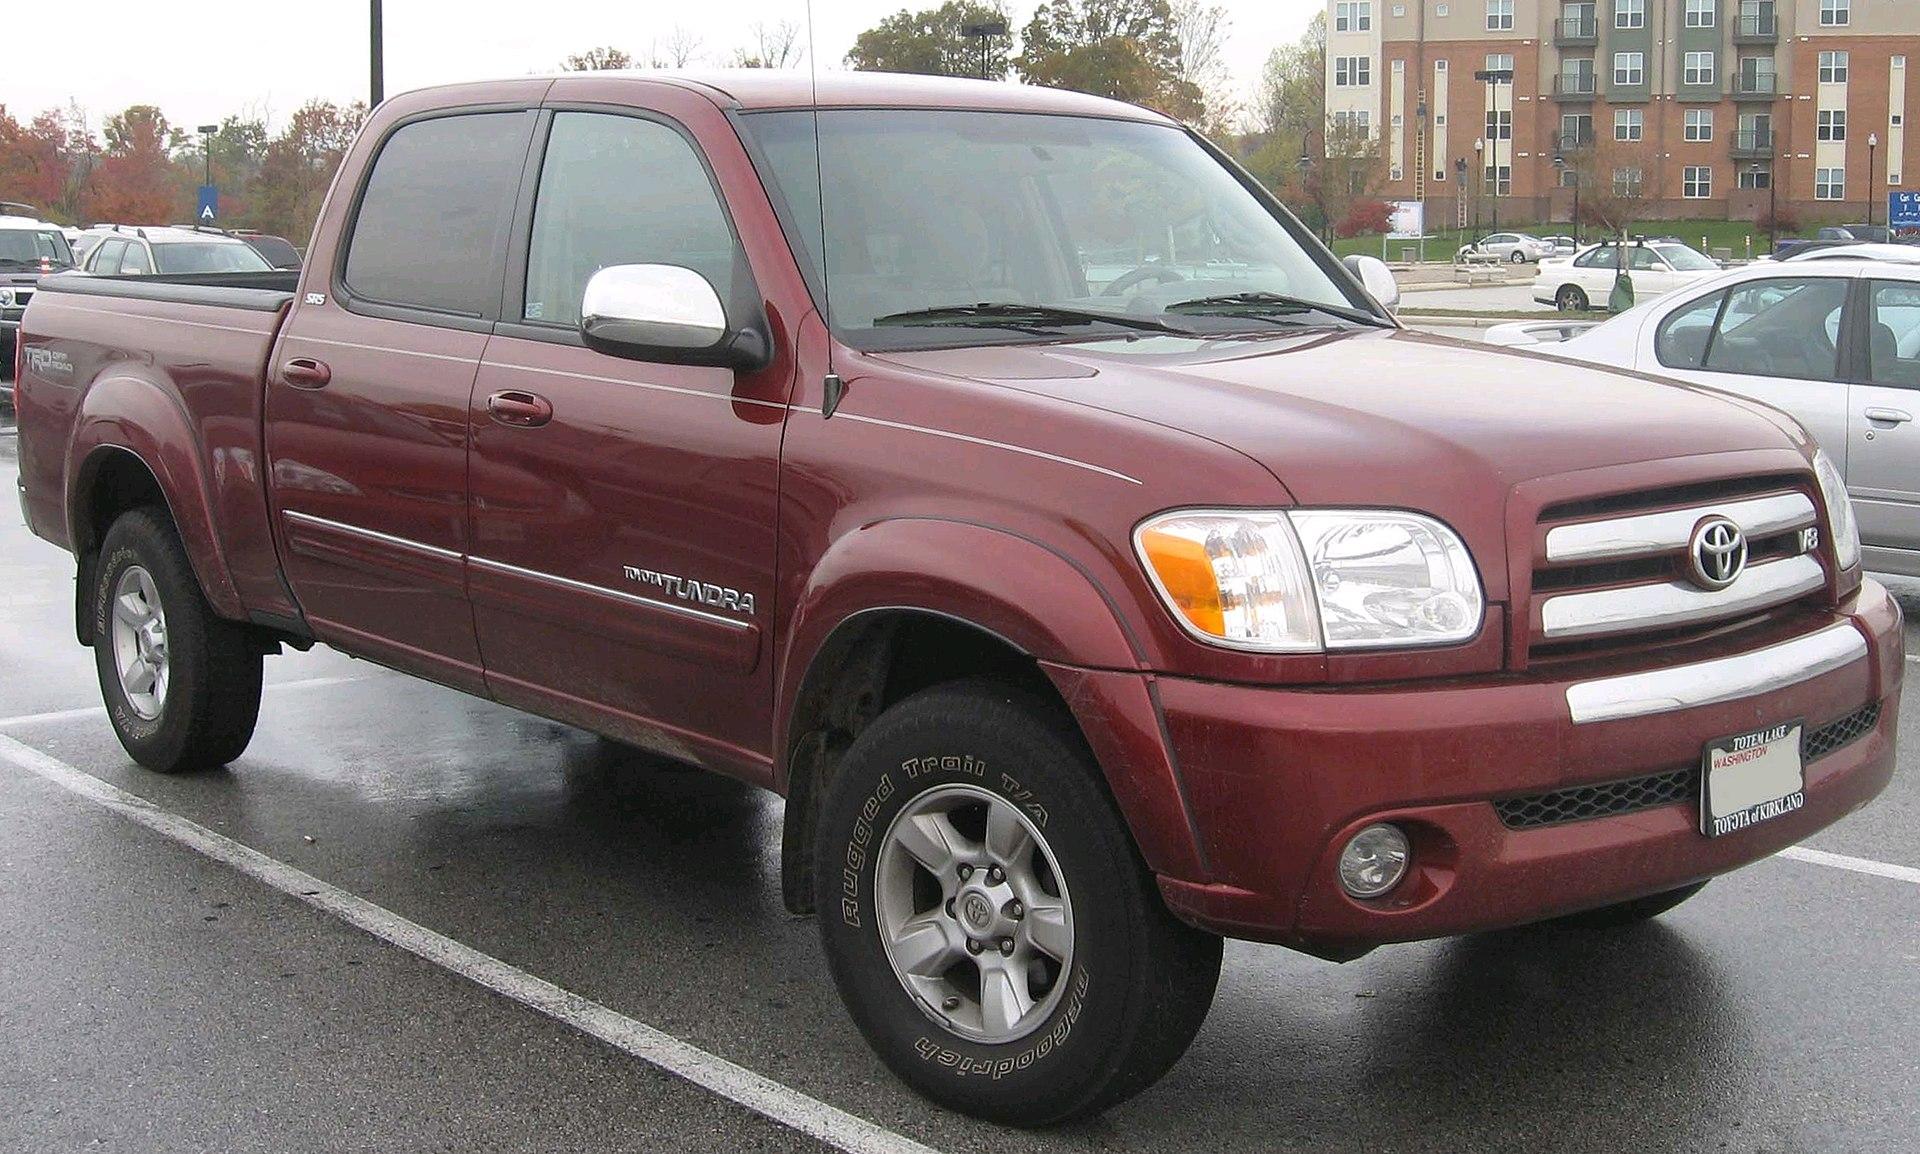 https://upload.wikimedia.org/wikipedia/commons/thumb/4/46/1st-Toyota-Tundra-DoubleCab-SR5.jpg/1920px-1st-Toyota-Tundra-DoubleCab-SR5.jpg